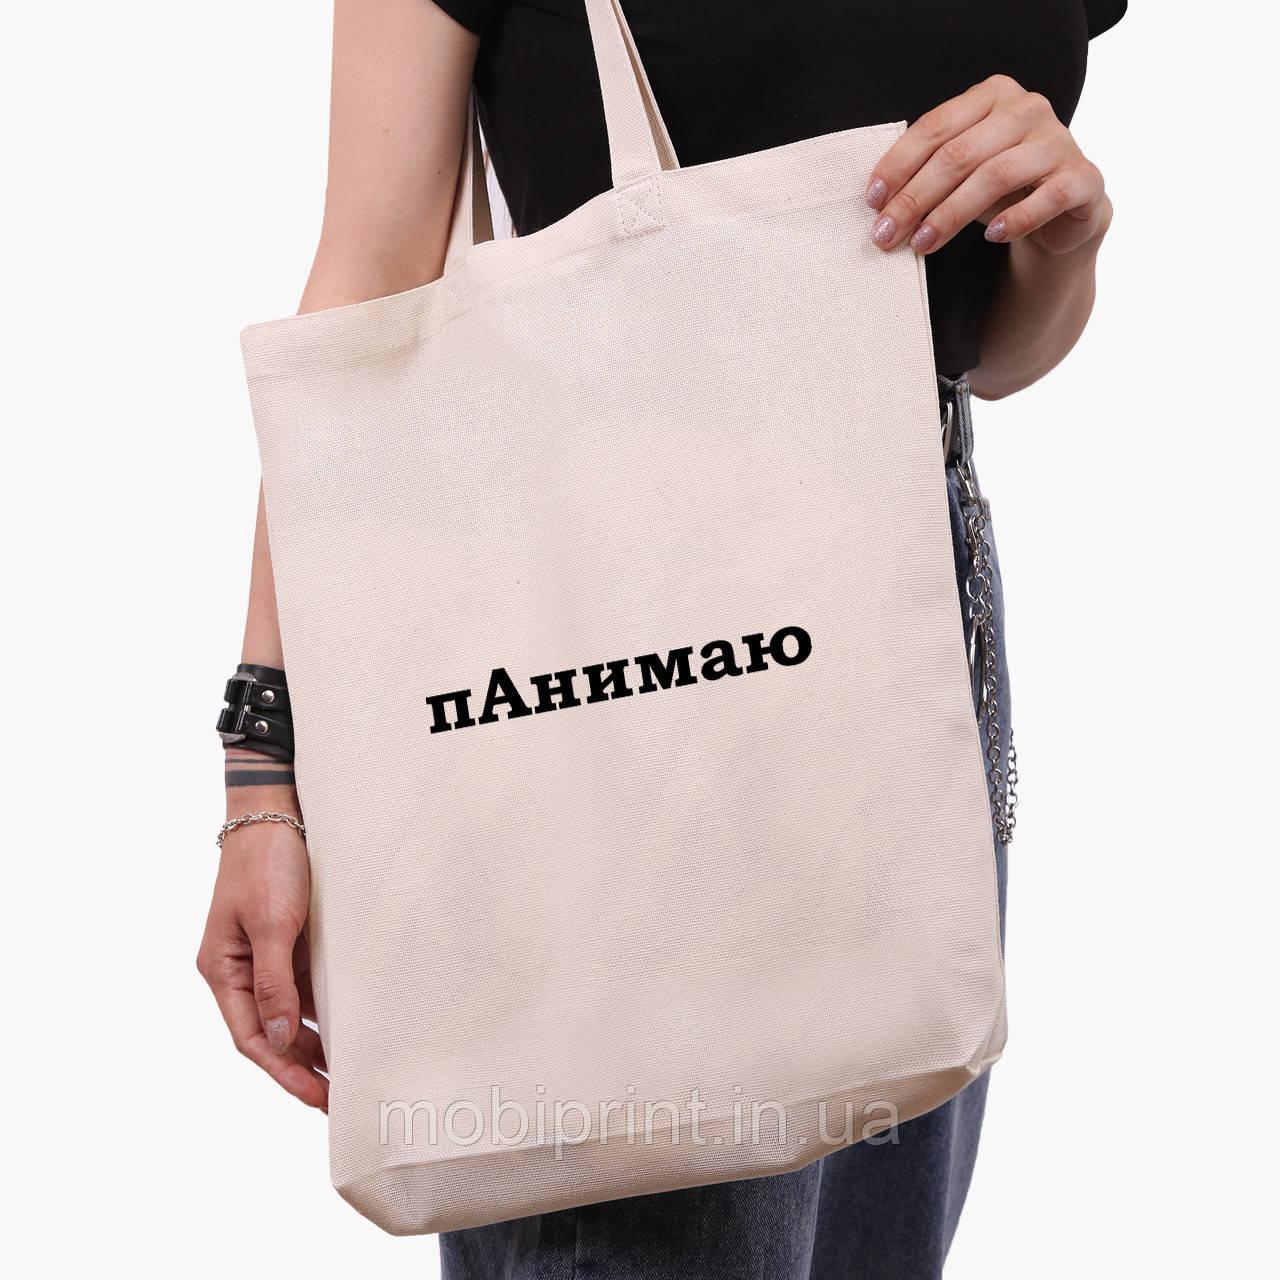 Еко сумка шоппер біла пАнимаю (9227-1282-1) 41*39*8 см